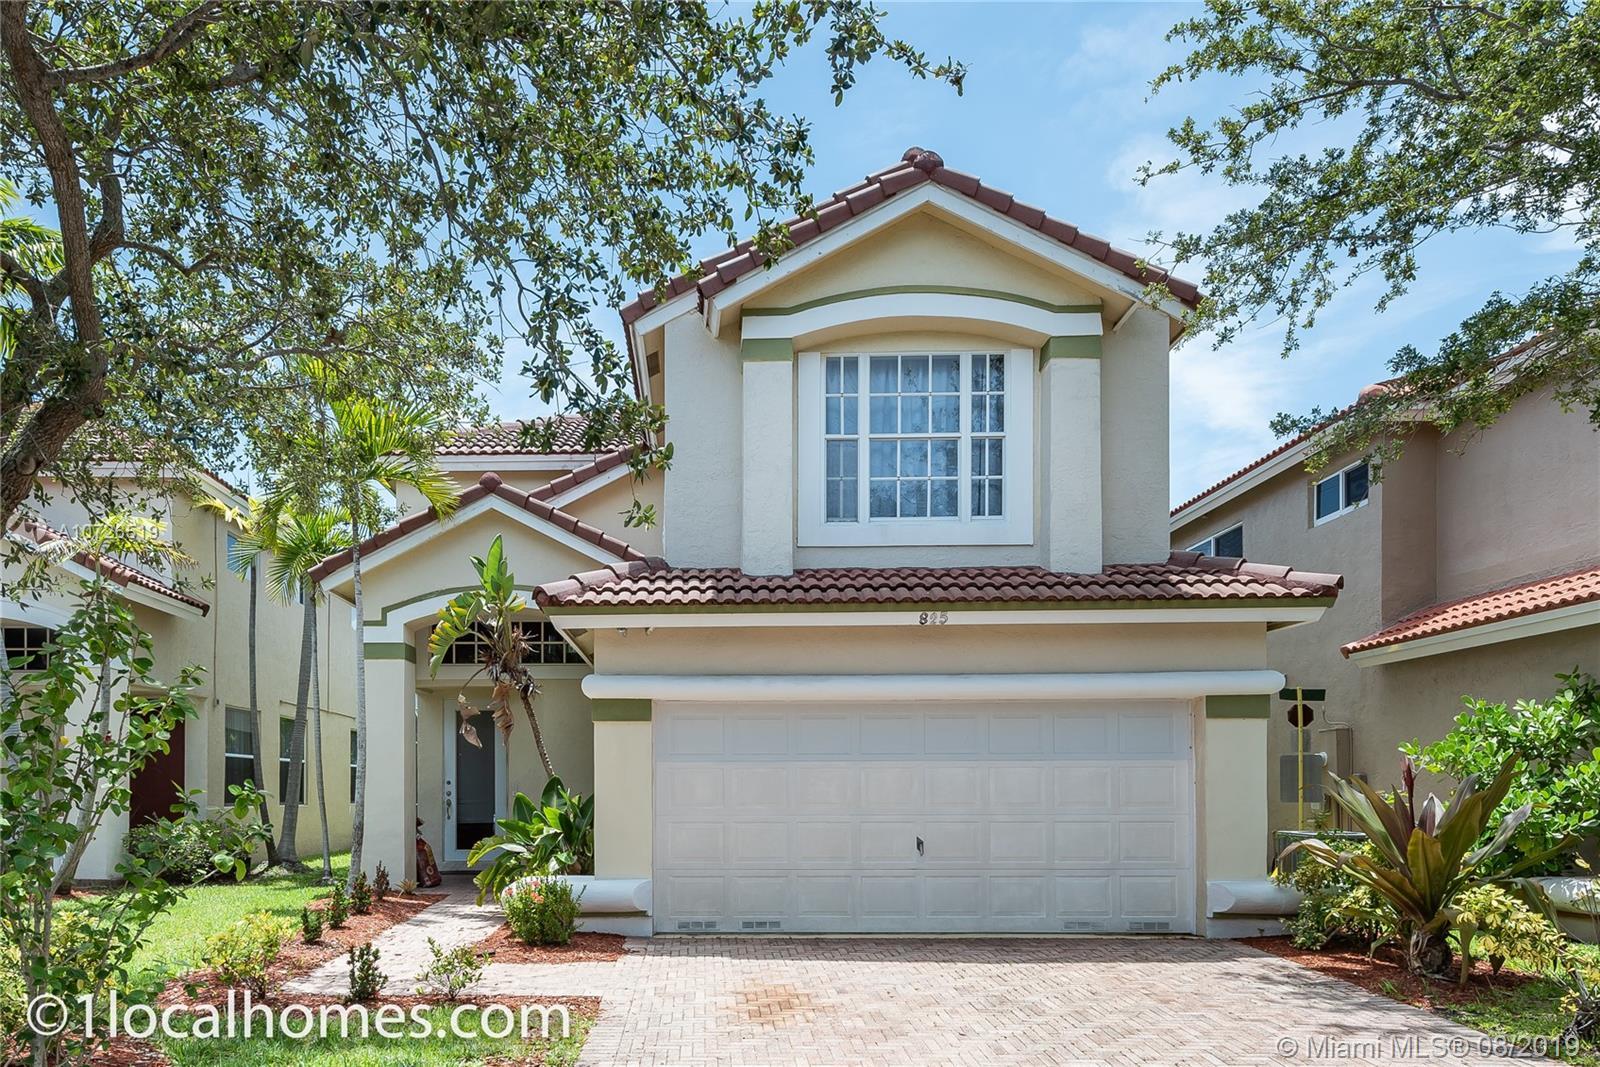 825 Natures Cove Rd, Dania Beach, FL 33004